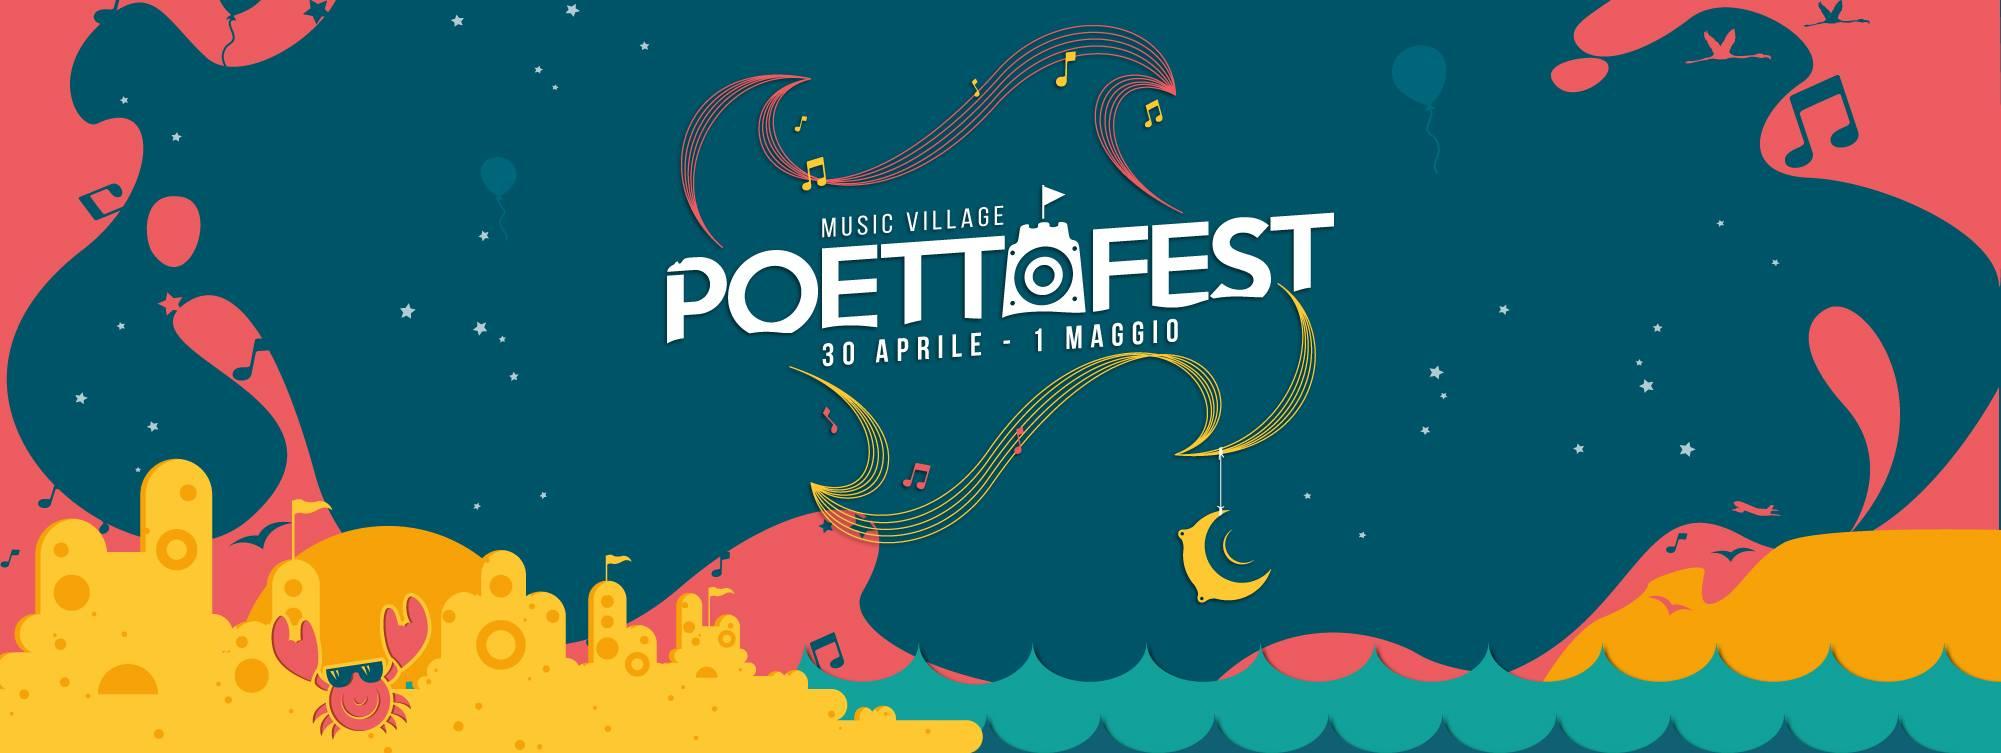 poettofest